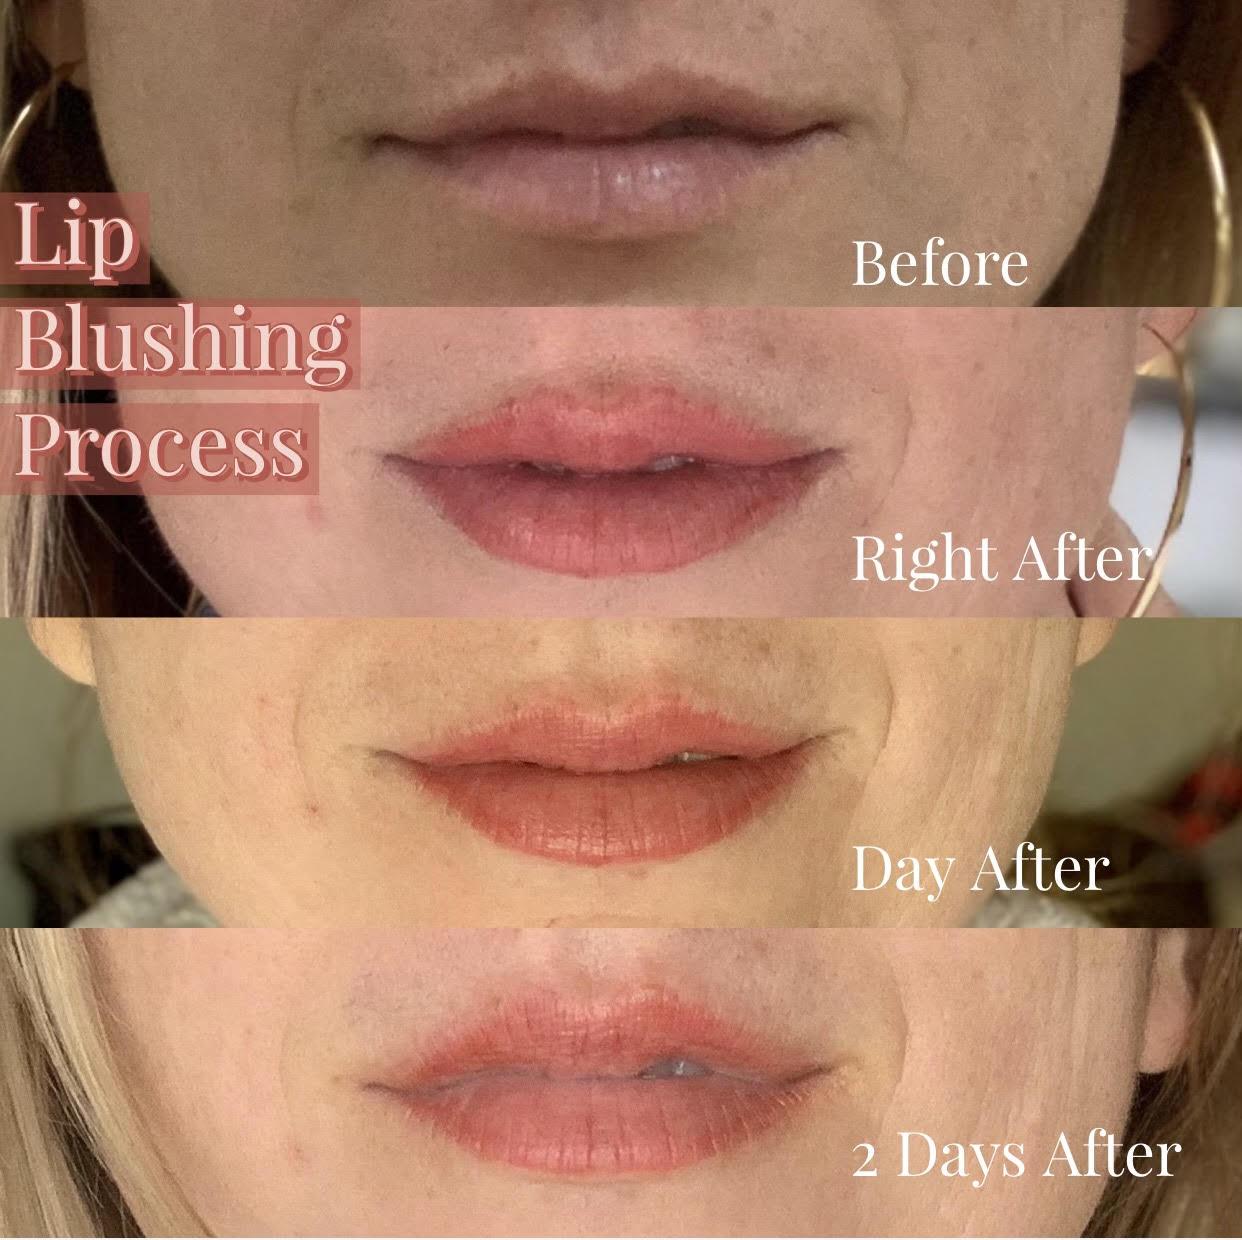 Lip Blushing | Bronzed Humanity